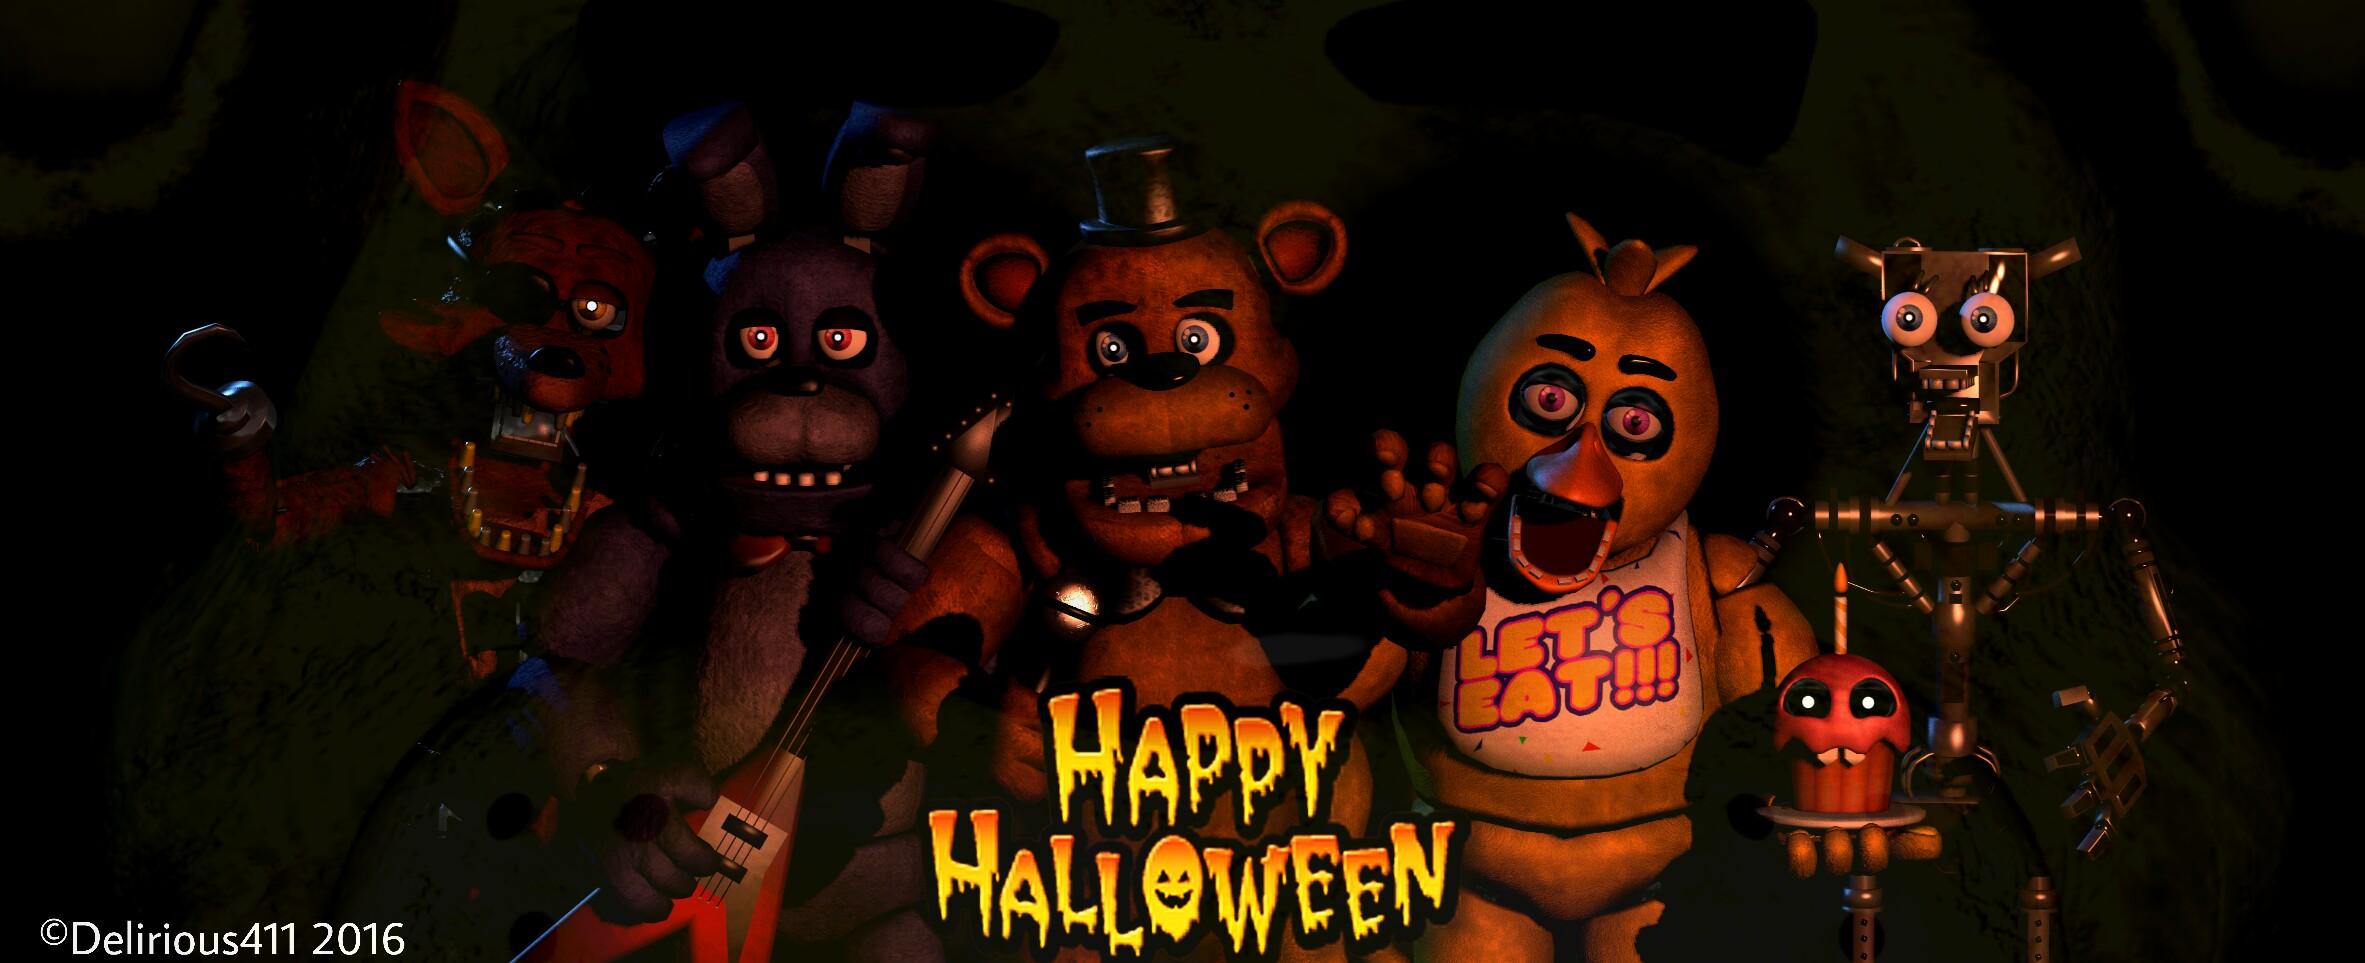 Halloween Freddy Toys : Happy halloween from freddy fazbear s pizza by